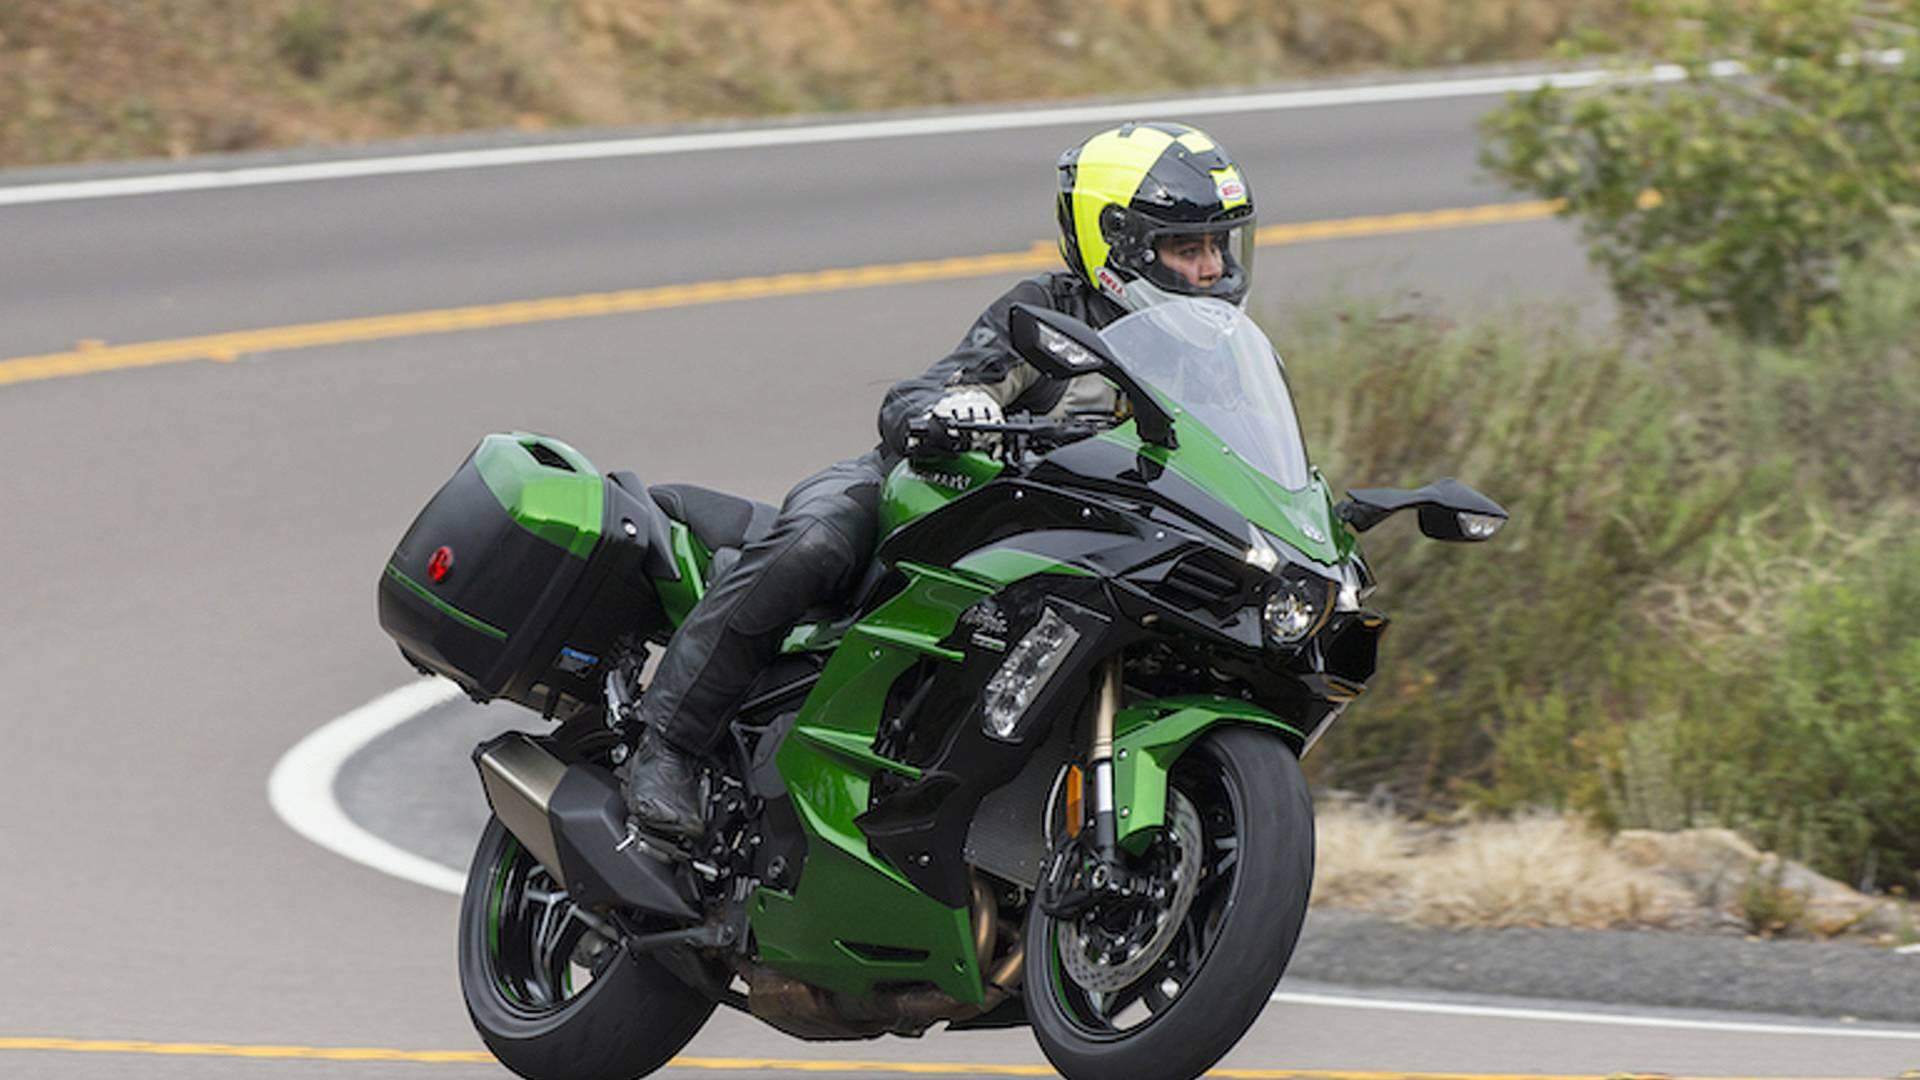 Тест-драйв мотоцикла Kawasaki Z1000SX